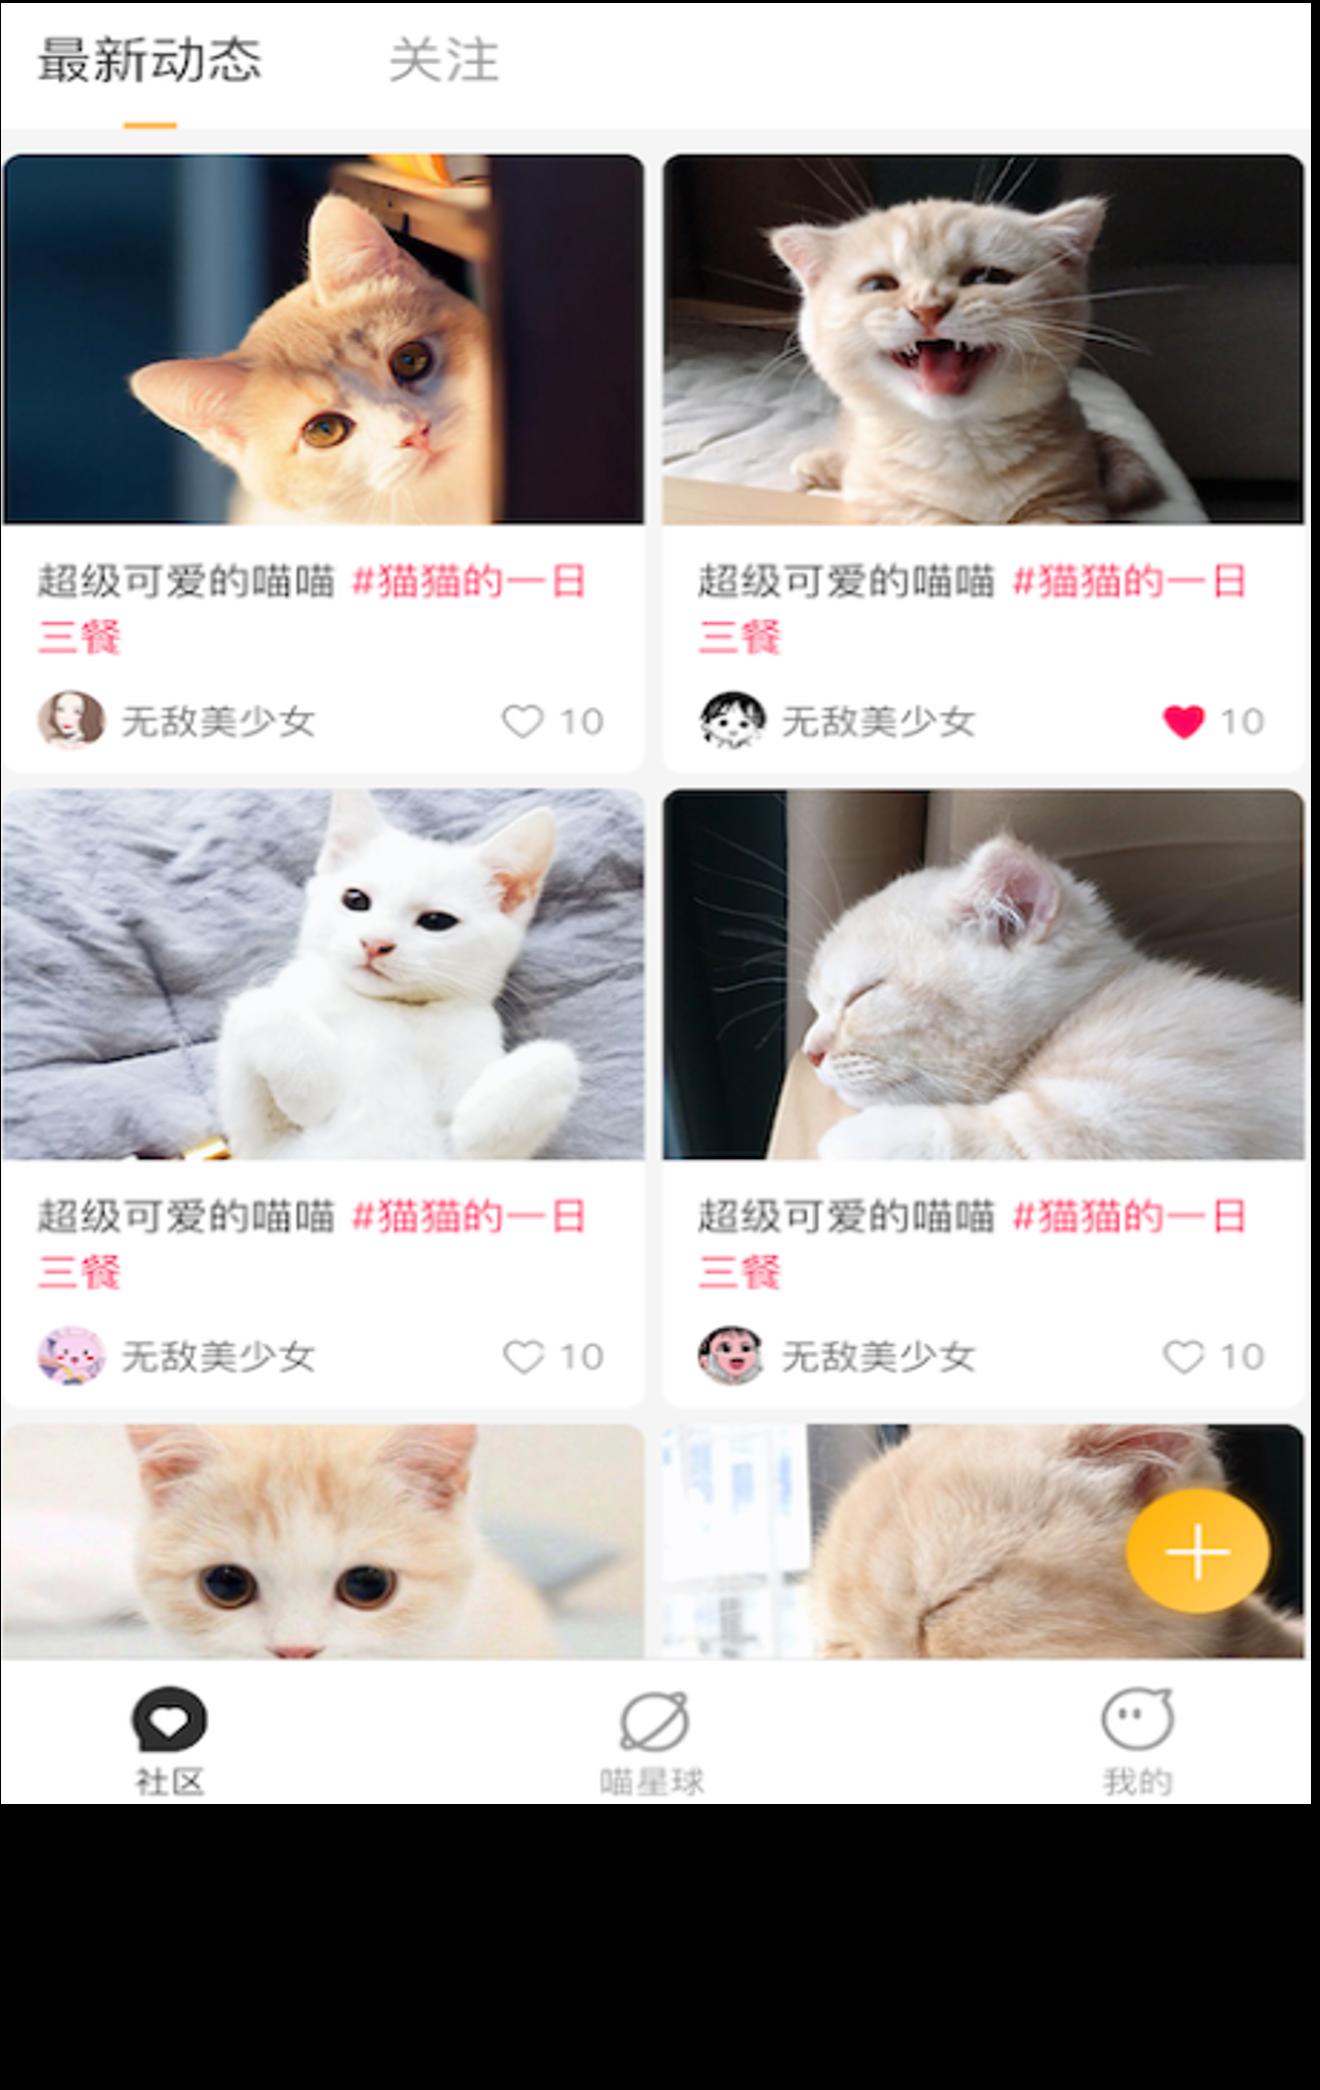 Cloud cat keeping phenomenon in China